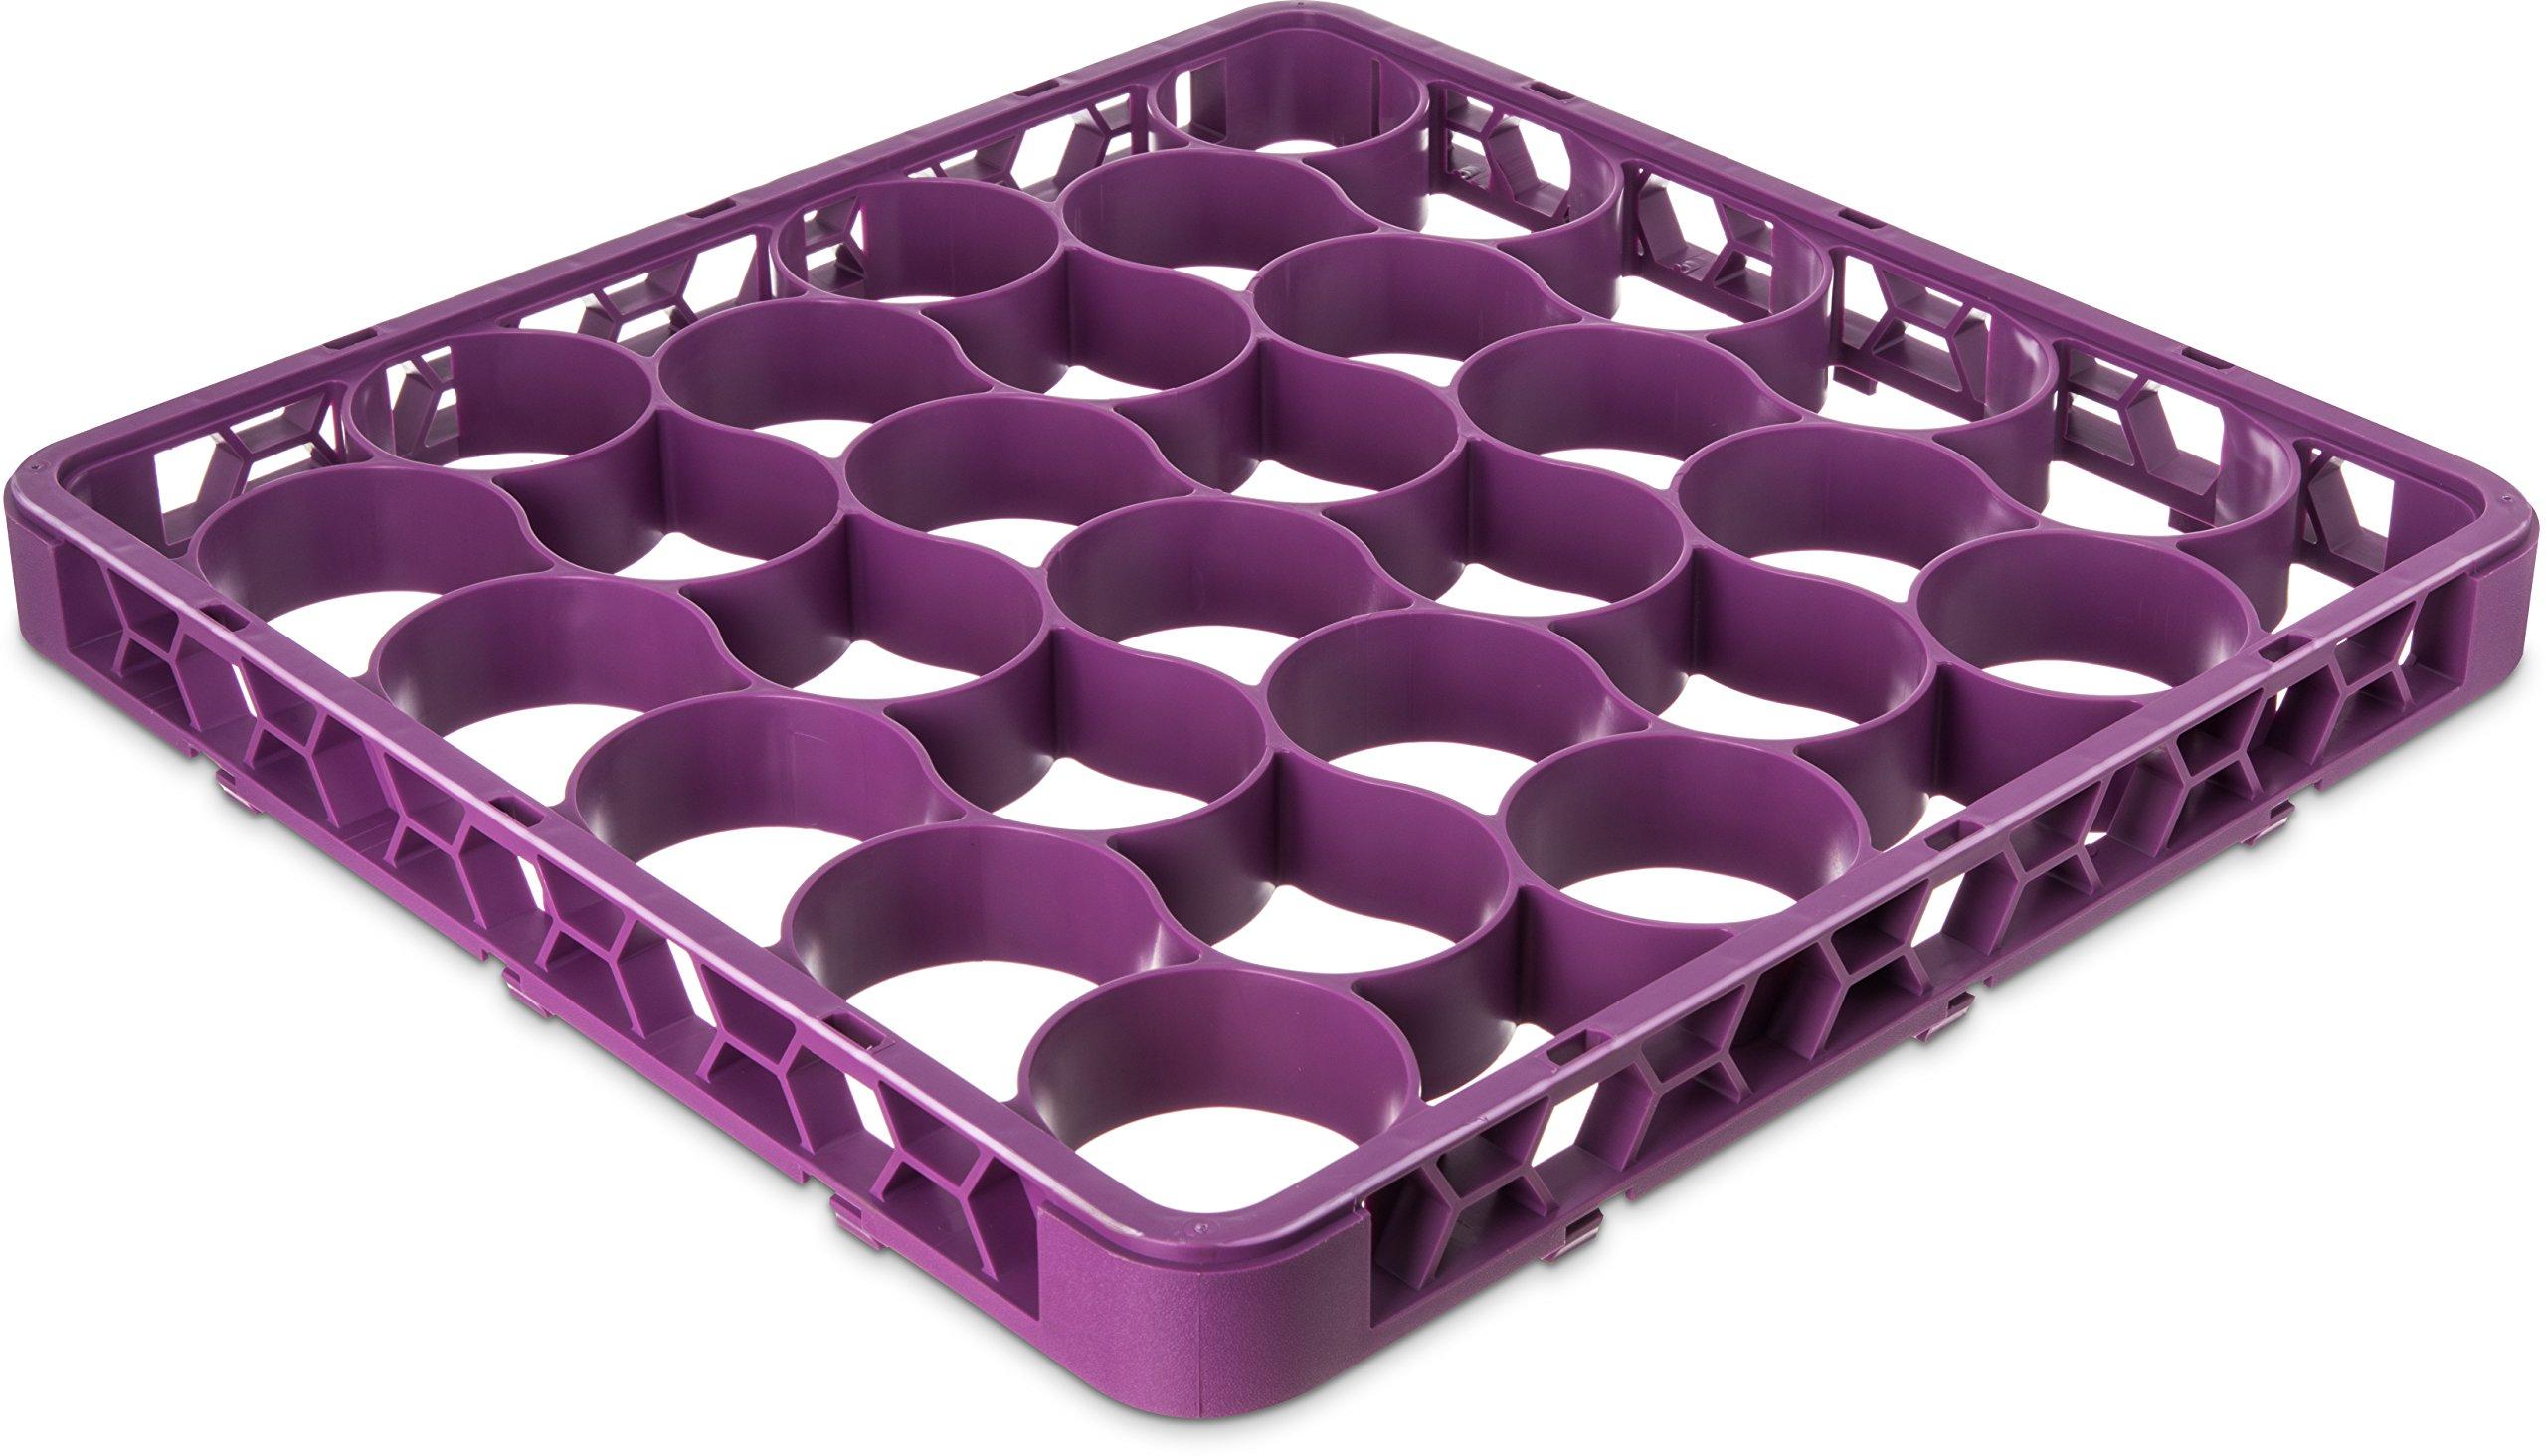 Carlisle REW30SC89 OptiClean NeWave 30 Compartment Glass Rack Extender, Lavender (Pack of 6)